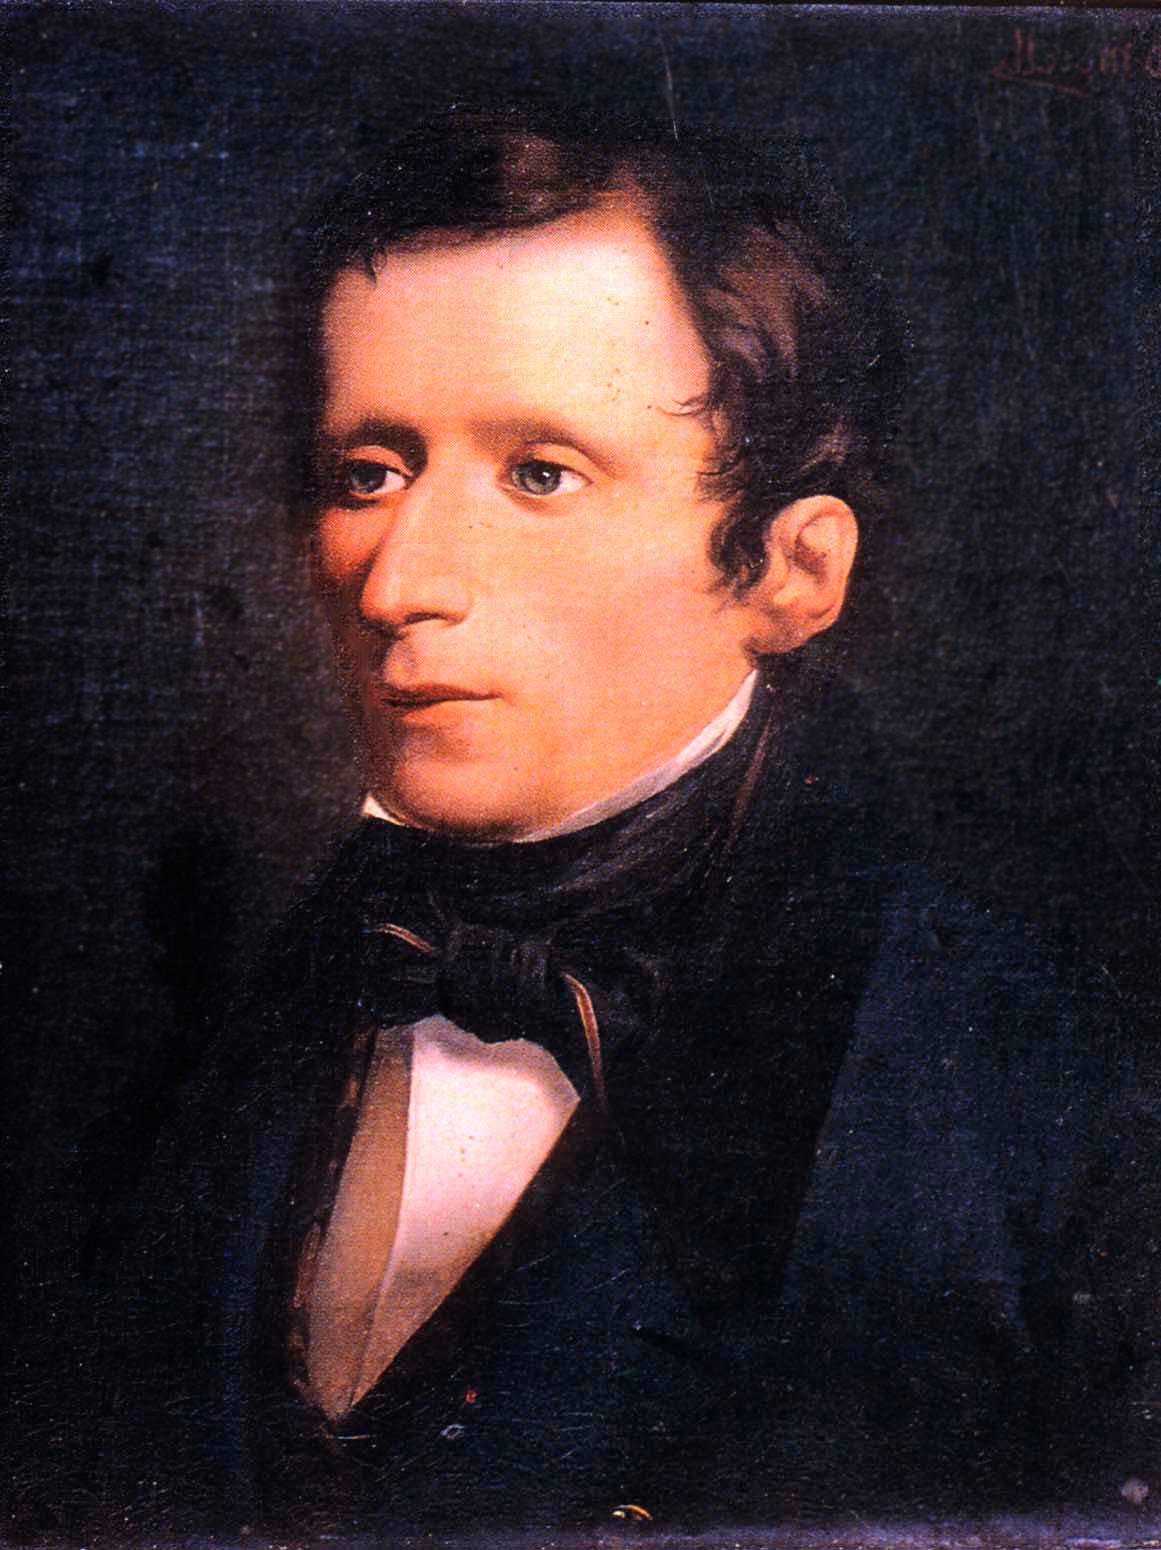 File:Giacomo Leopardi Morelli.jpg - Wikimedia Commons